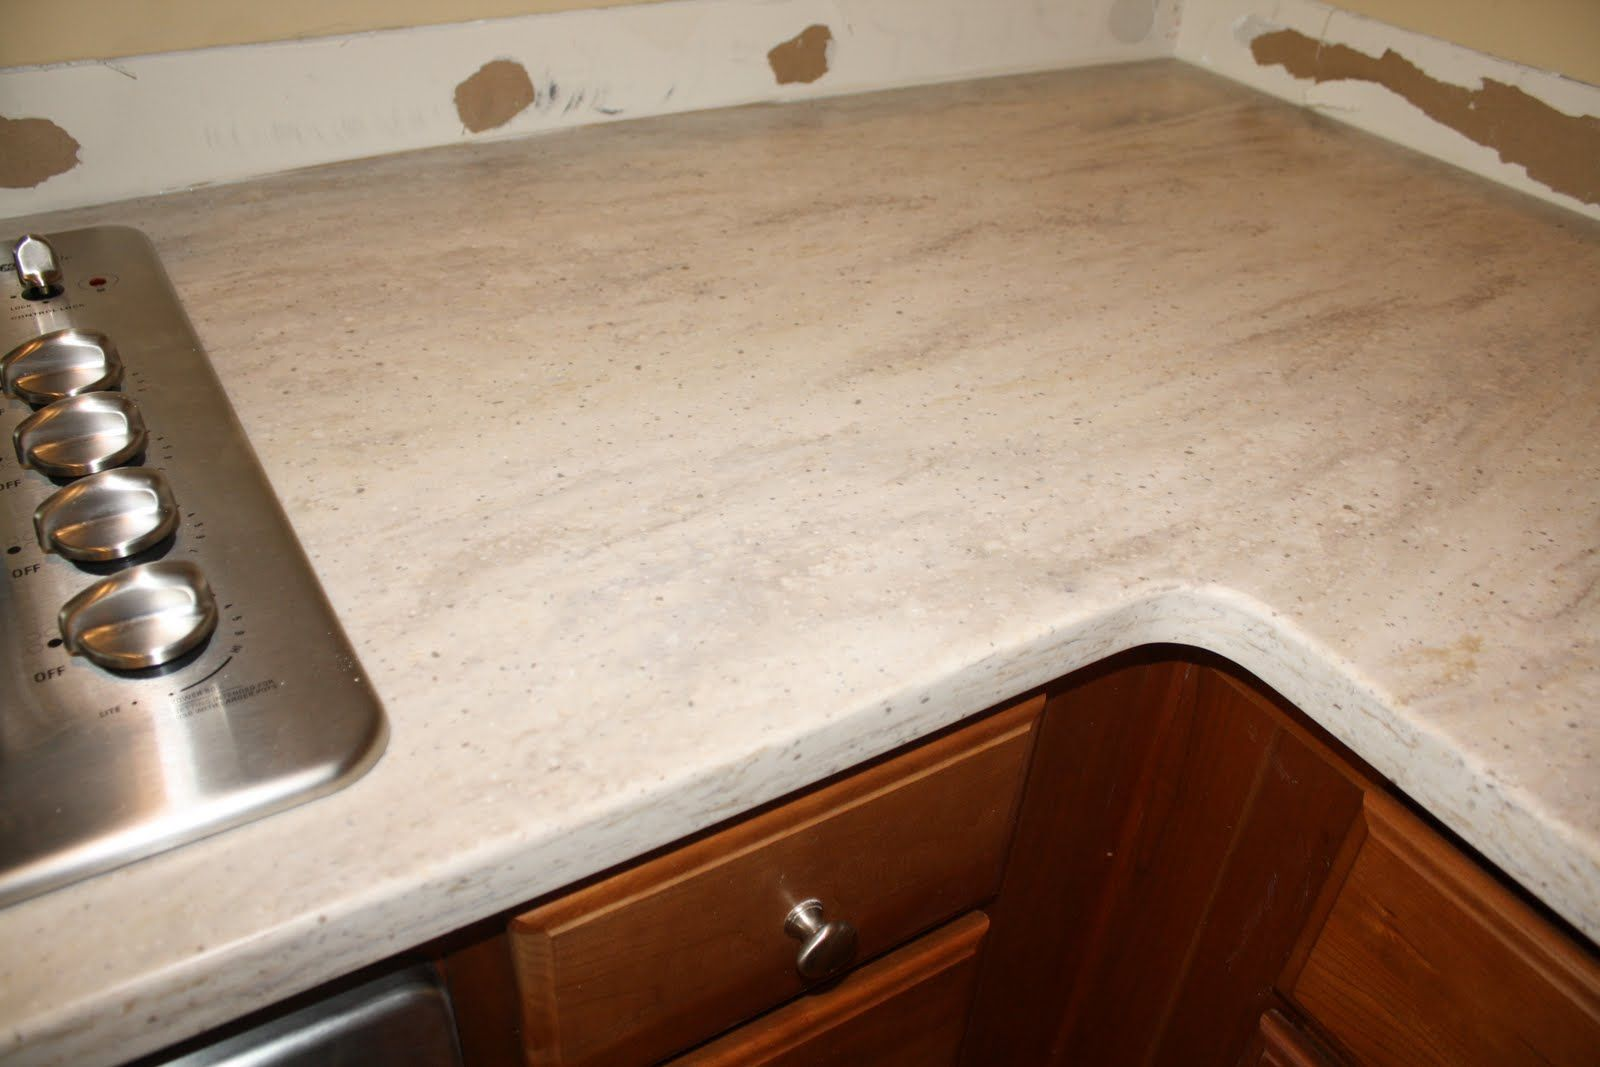 Counterintuitive Kitchen Countertops Corian Kitchen Countertops Countertops